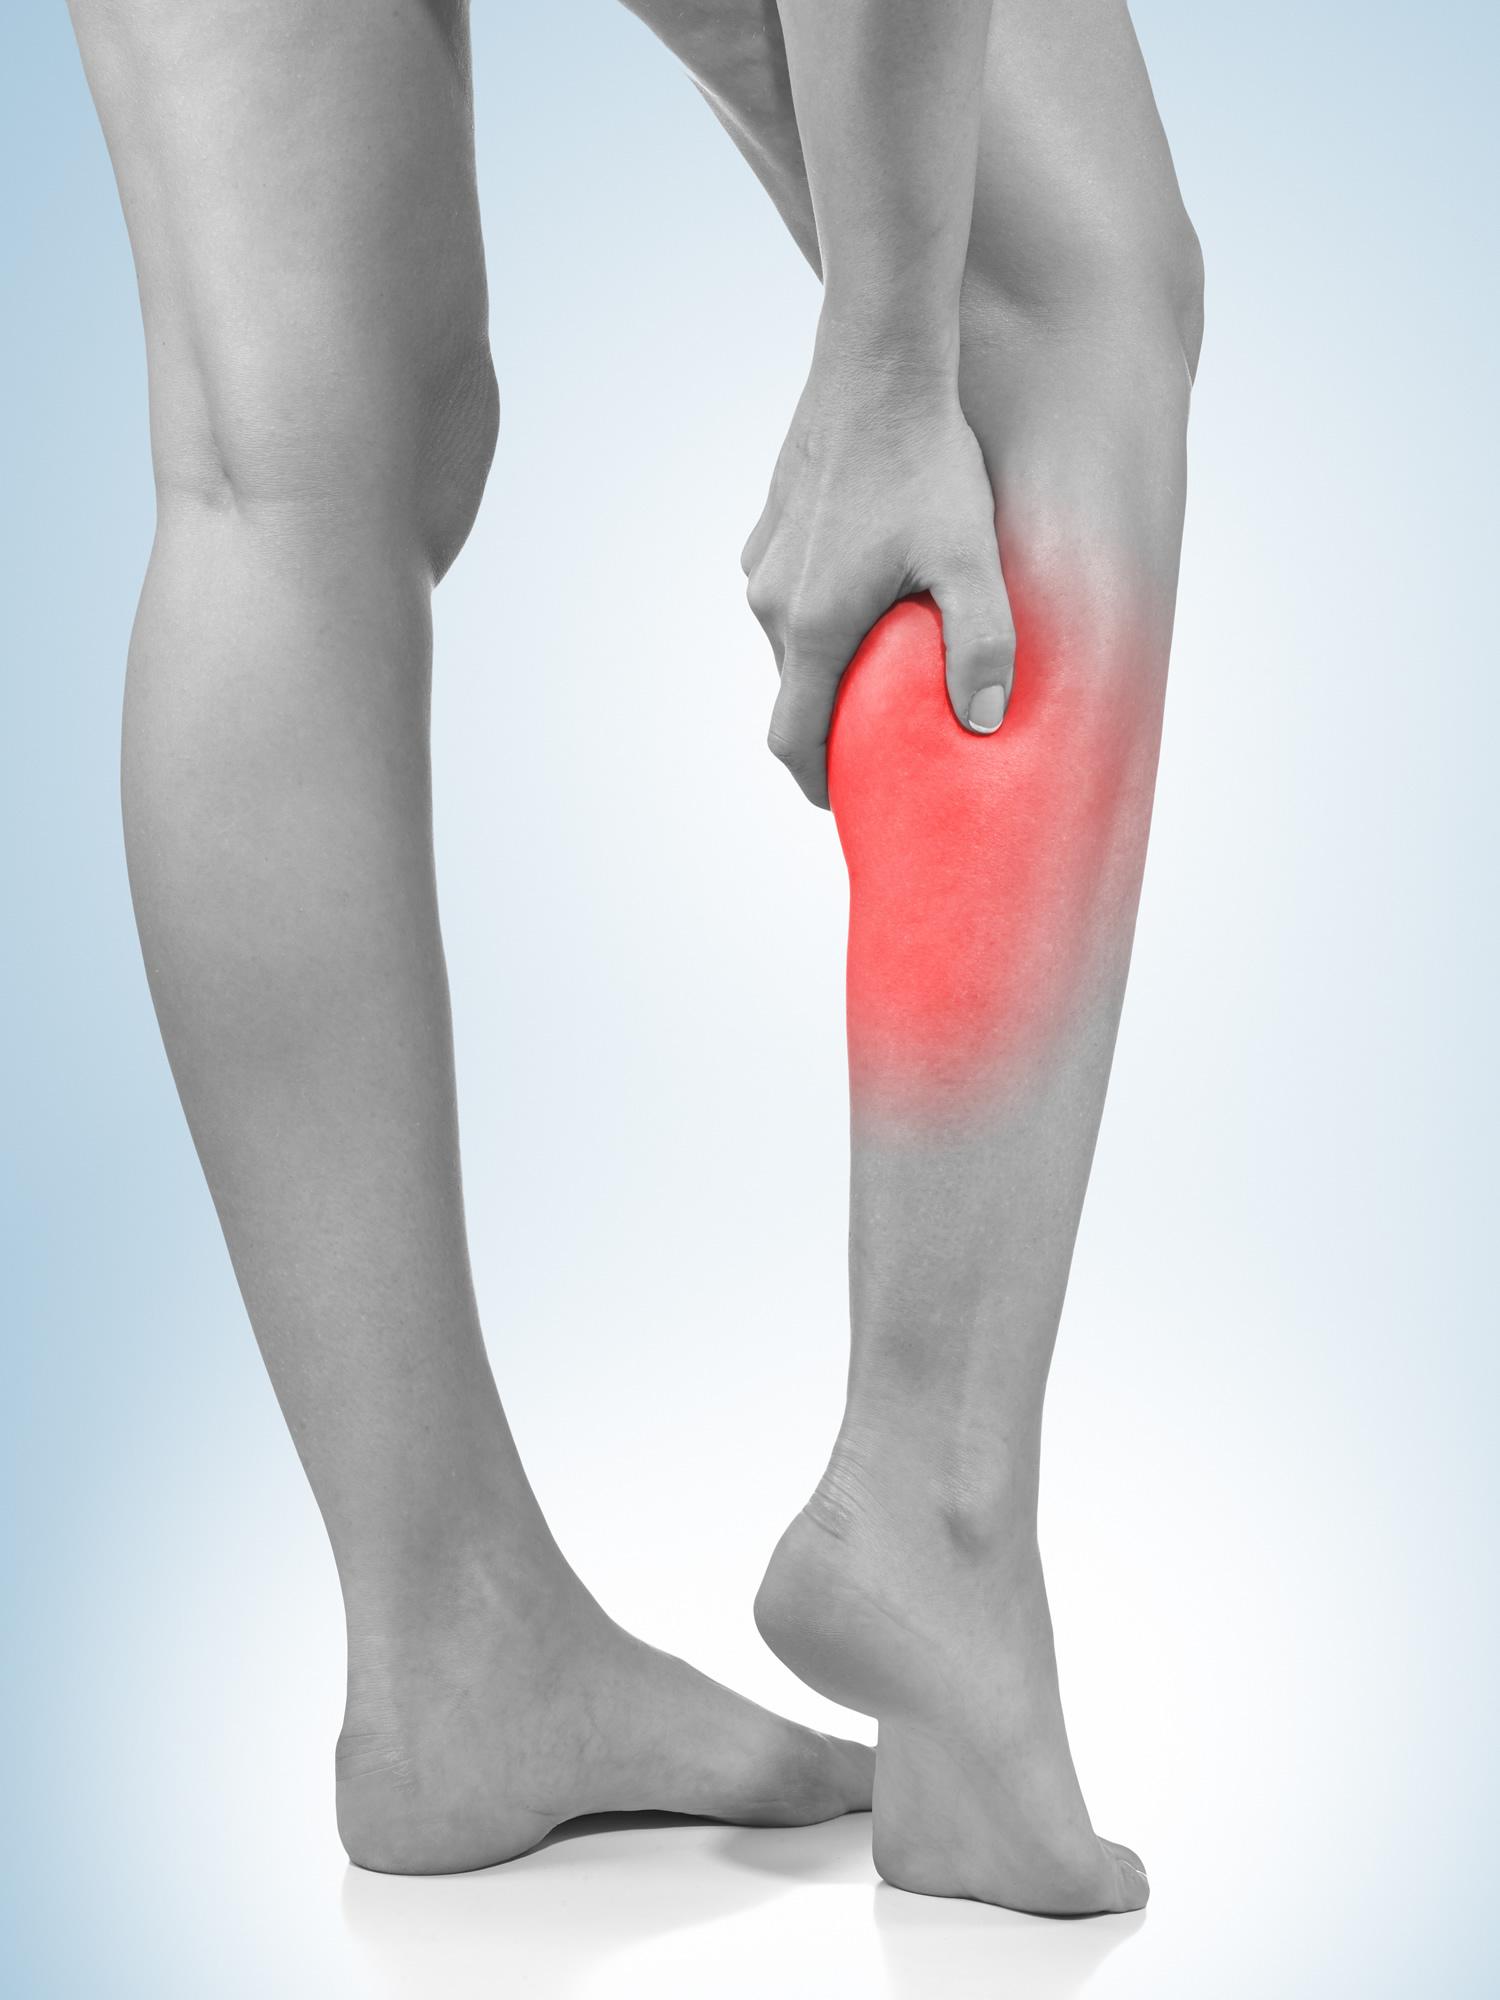 peripheral artery disease leg pain